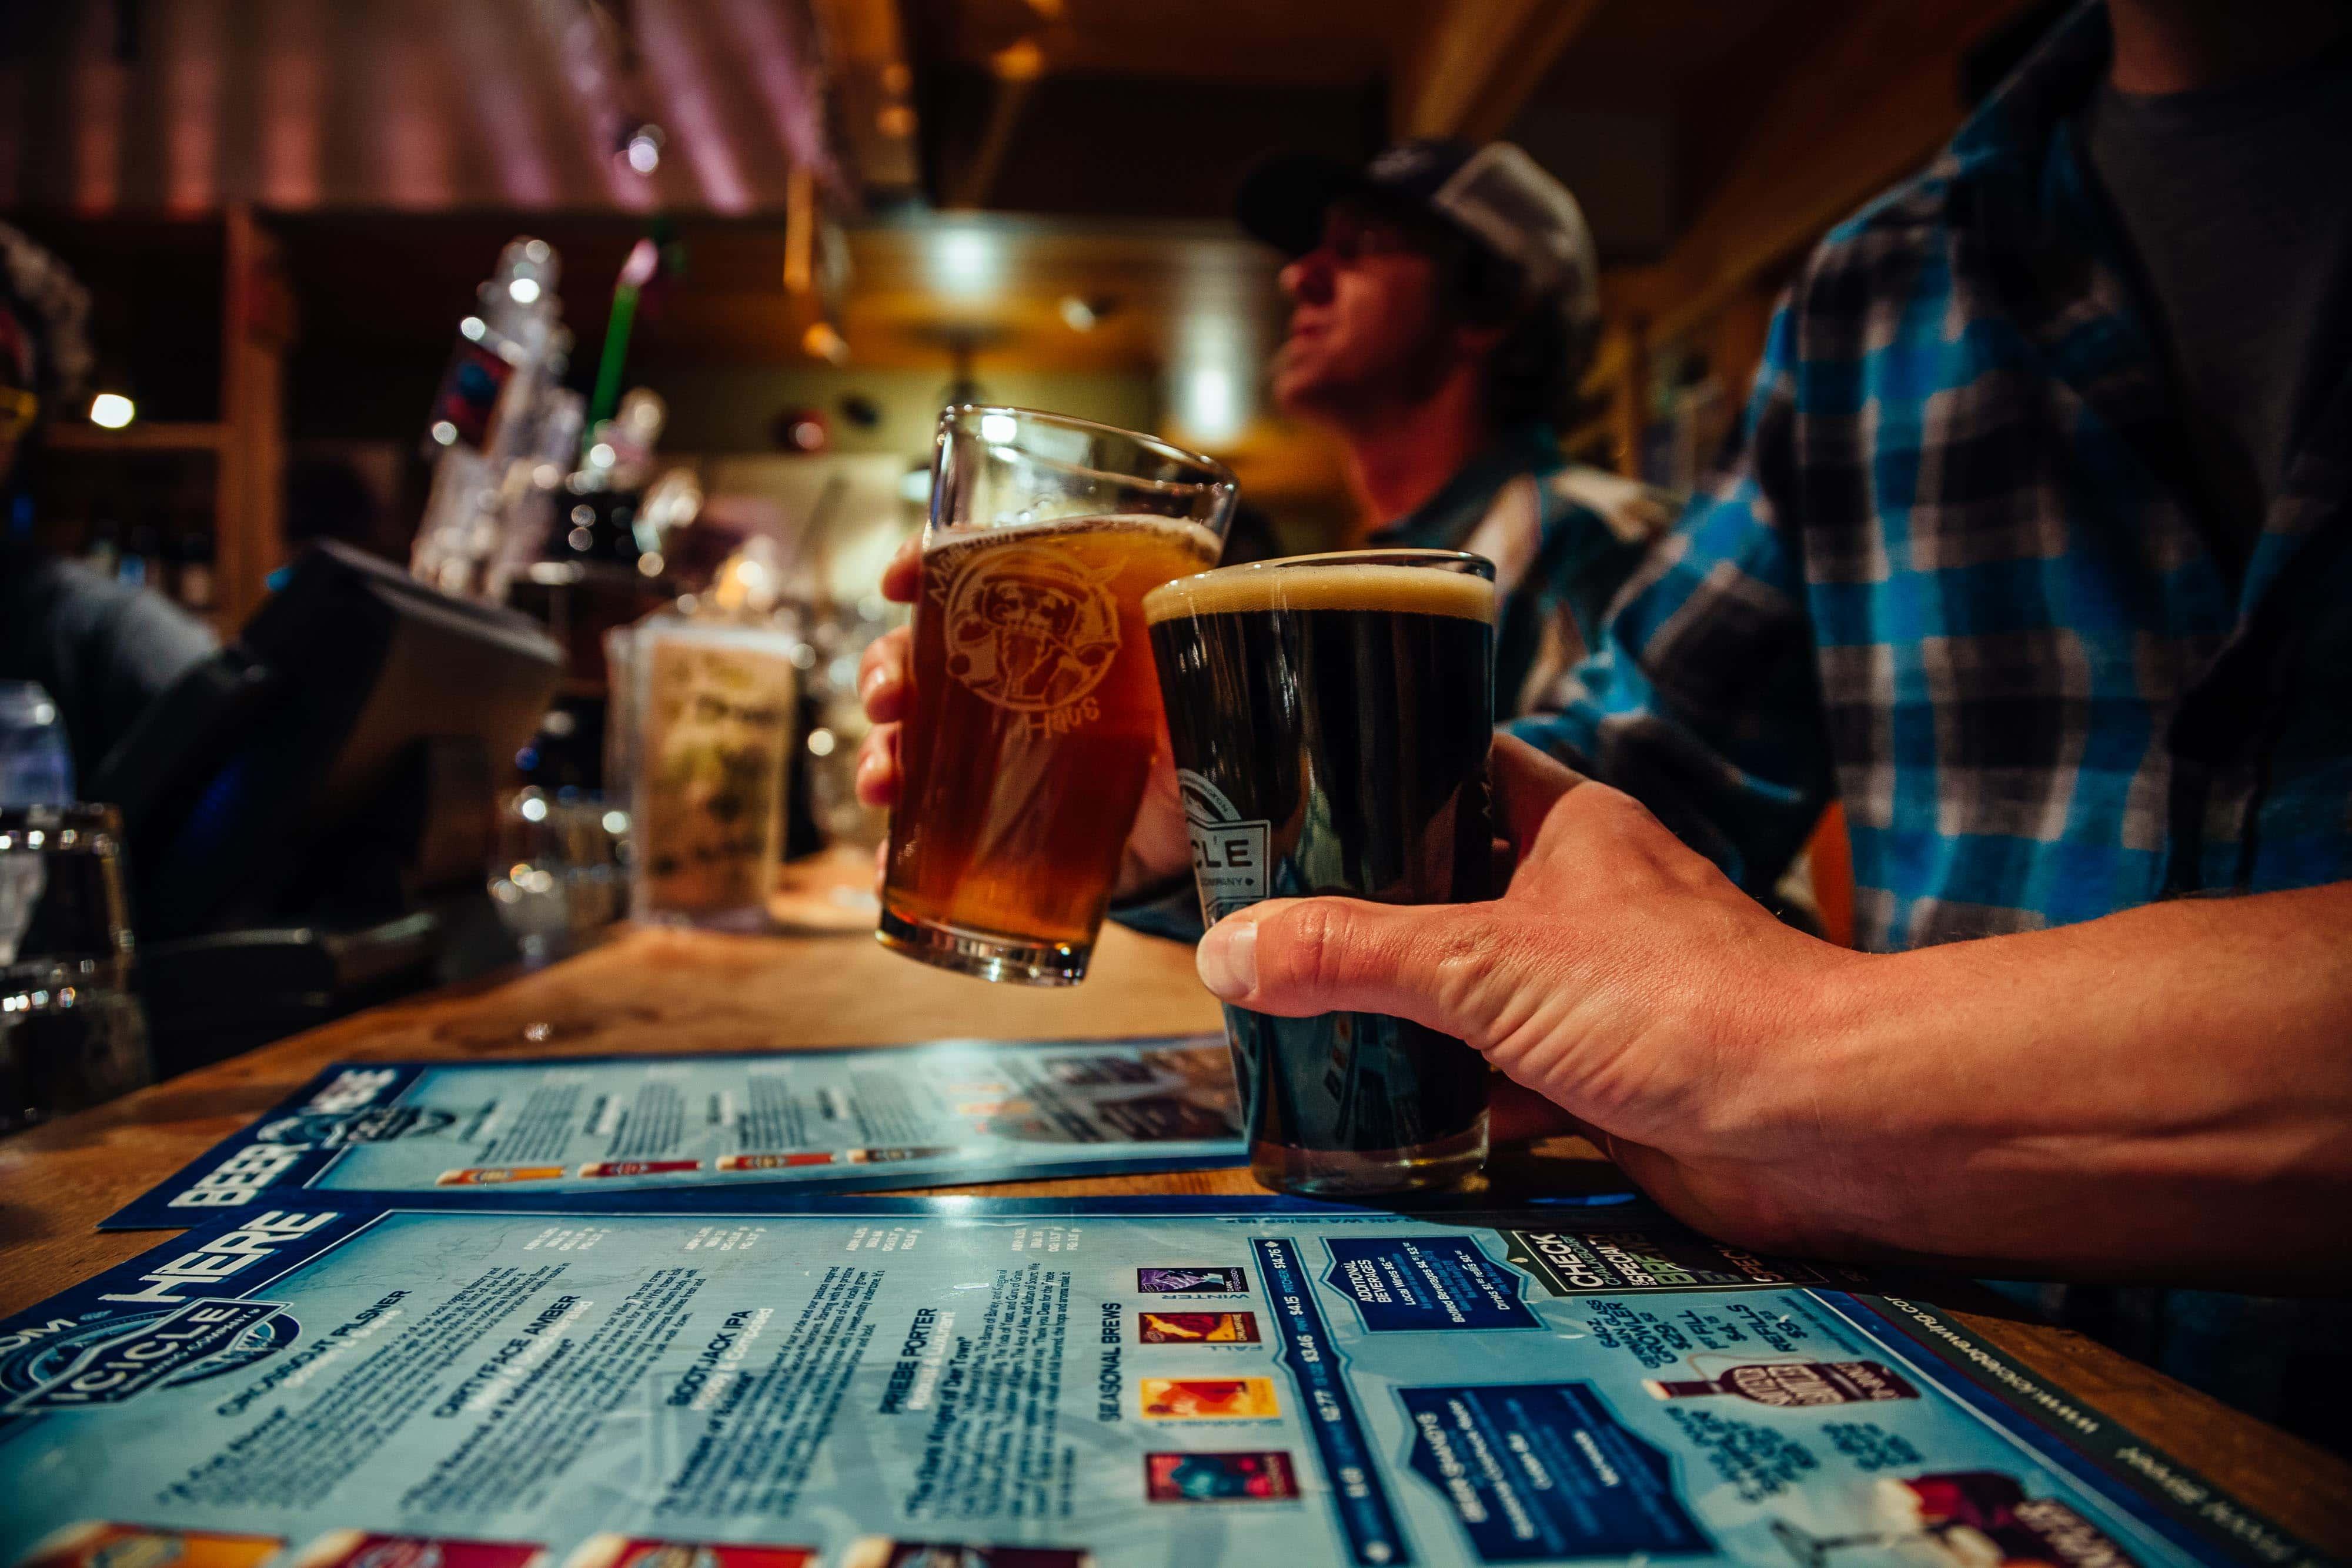 Best Beer Photo by Jay Goodrich